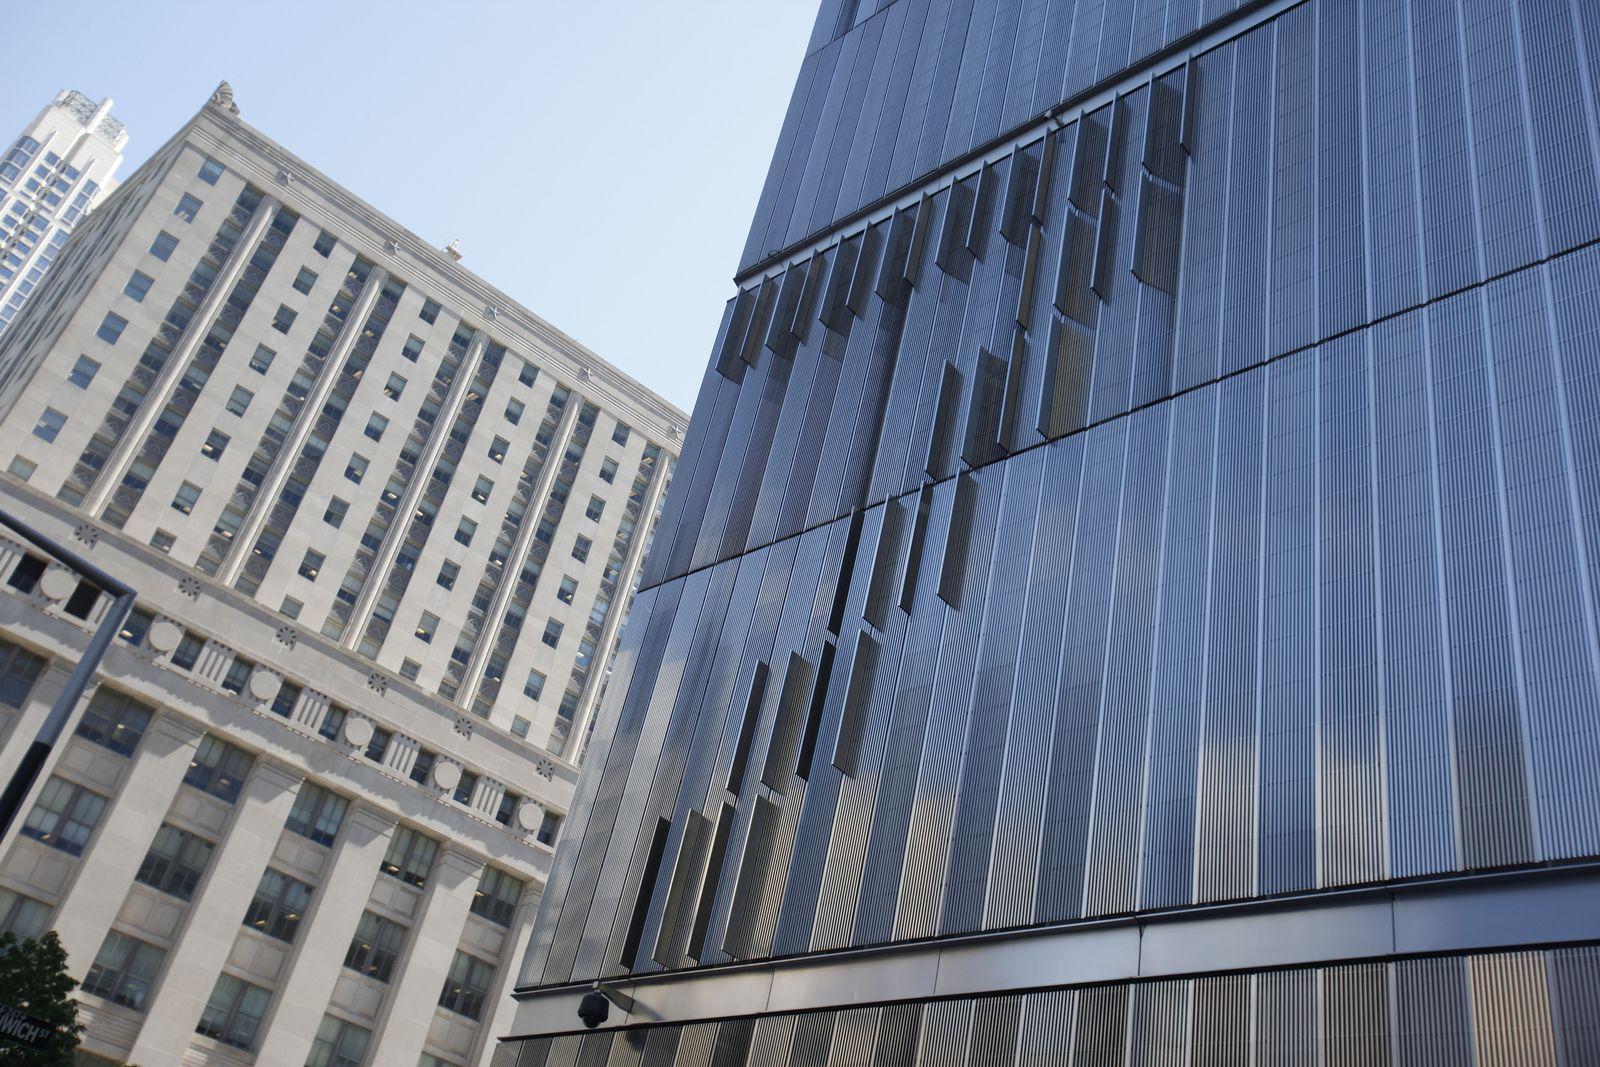 Moody's / Firmenzentrale / New York